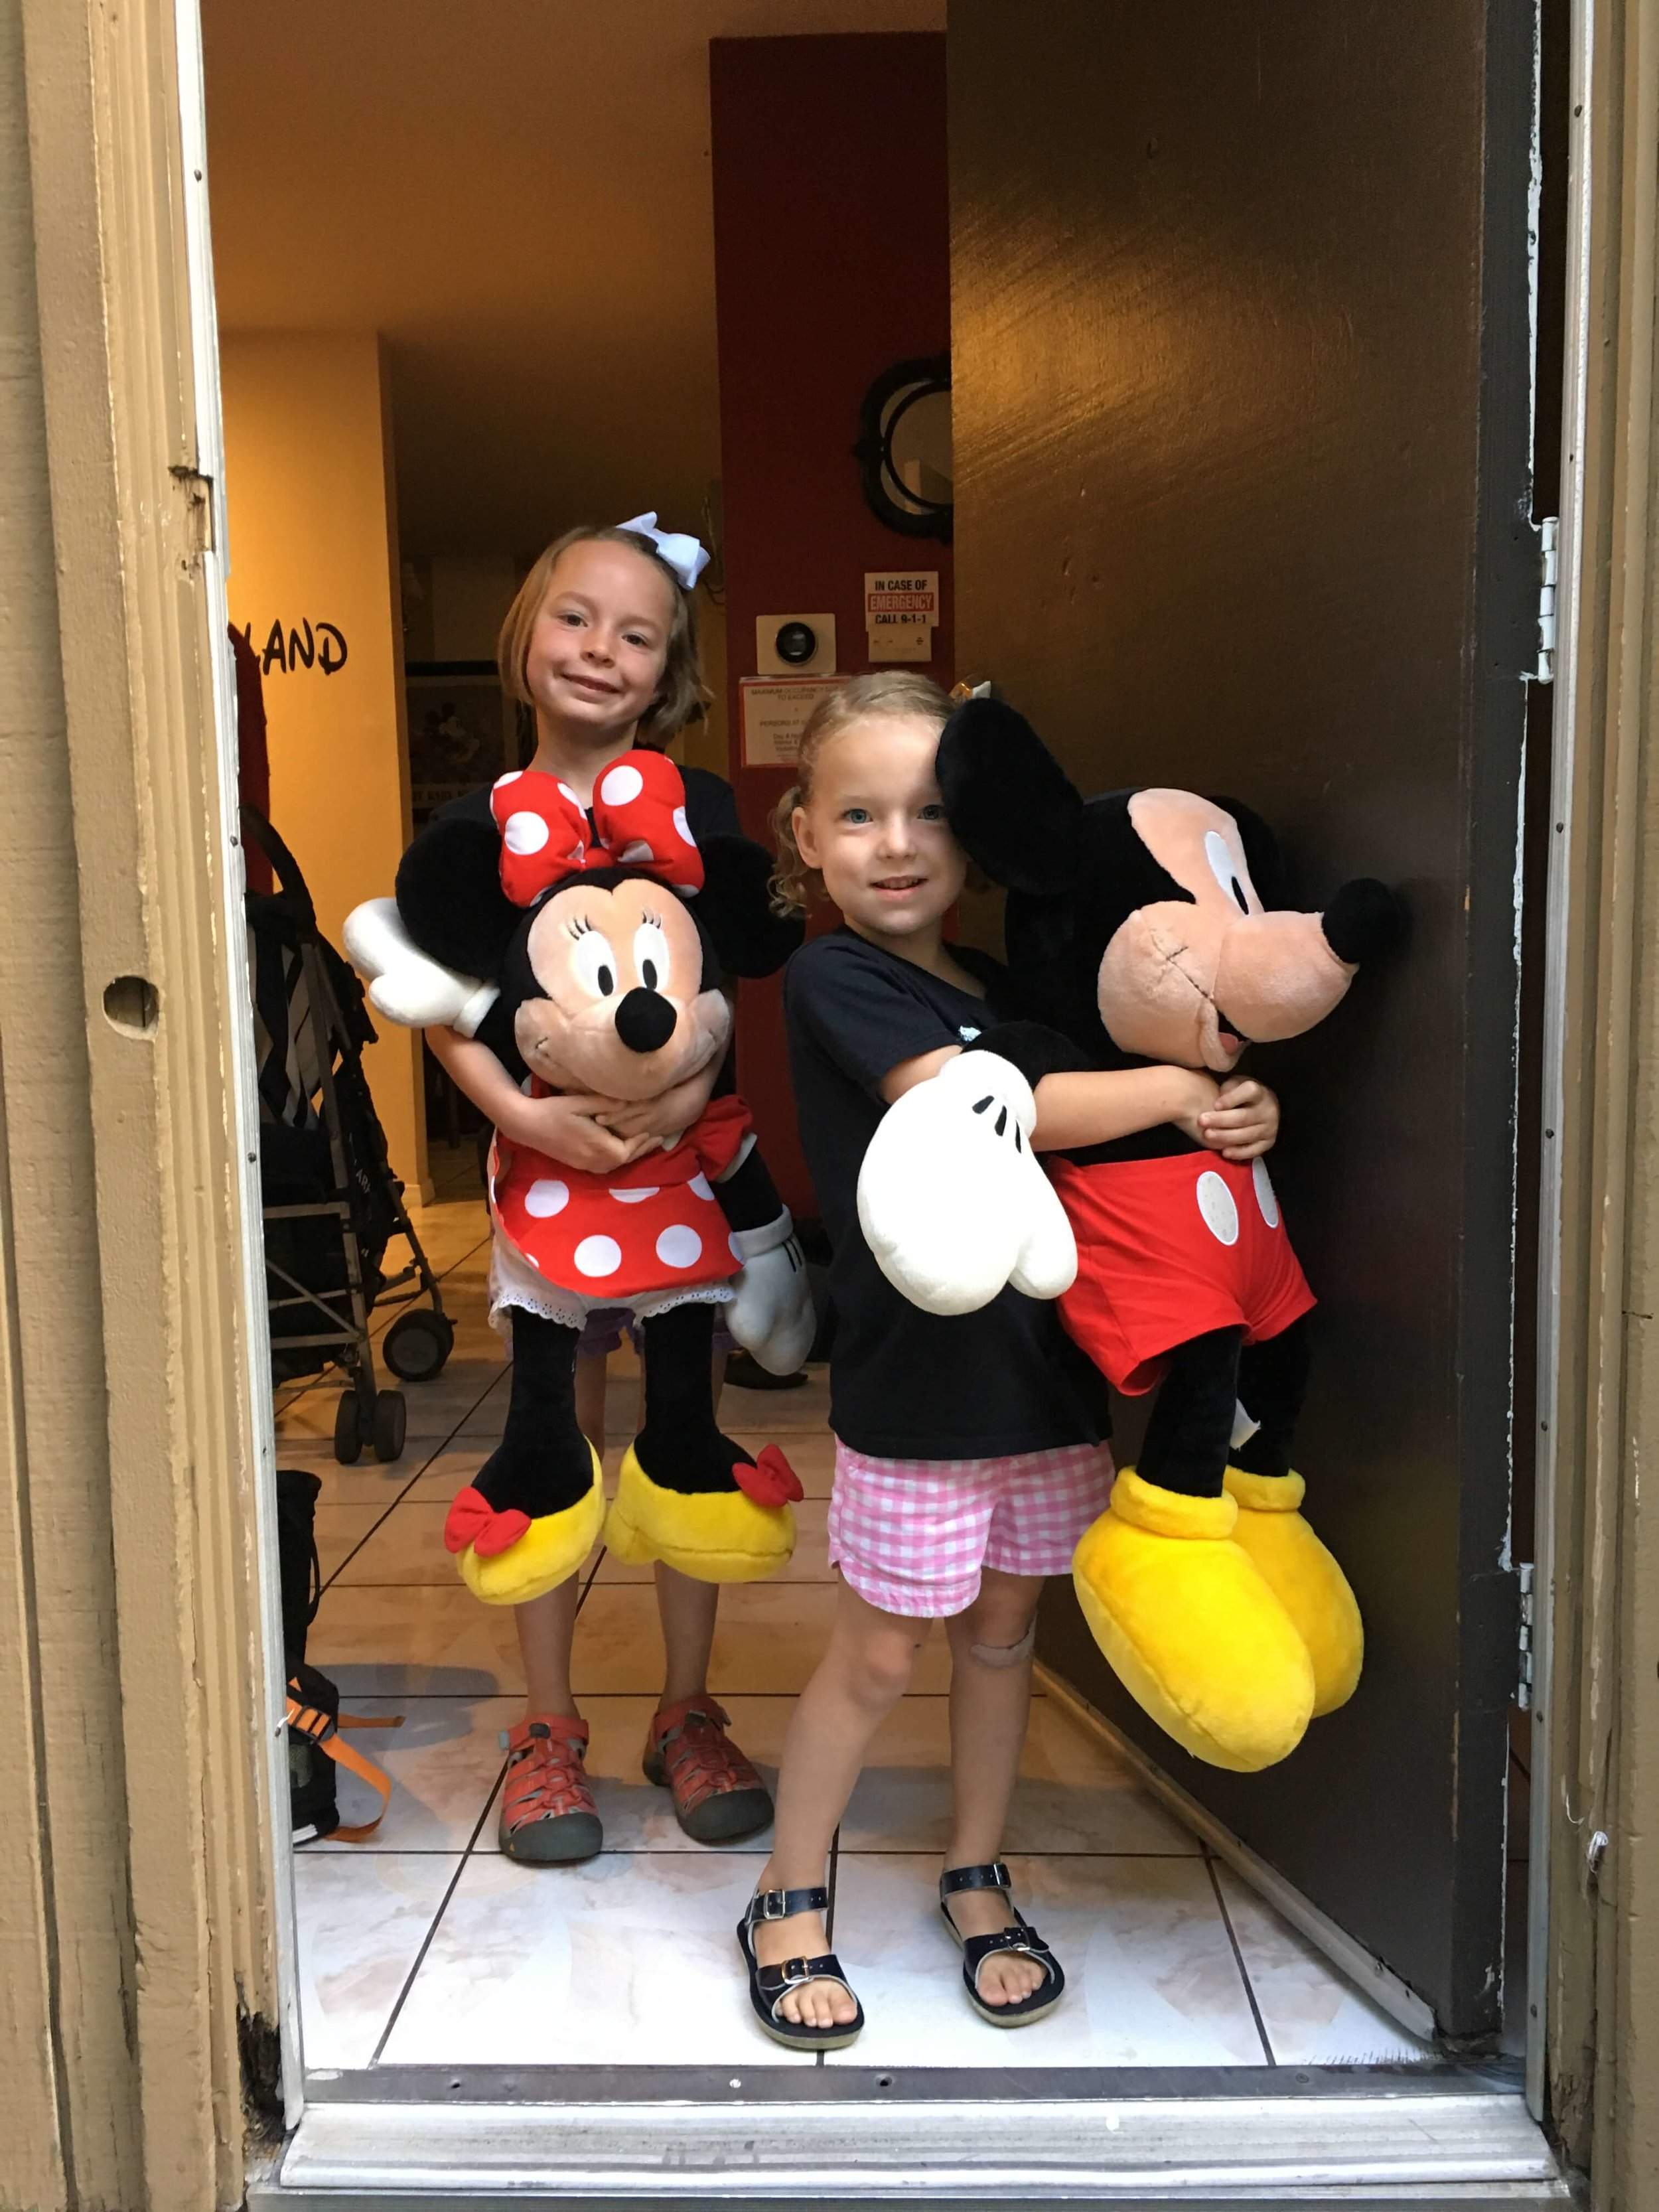 Bonus: massive plush Mickey and Minnie to play with.